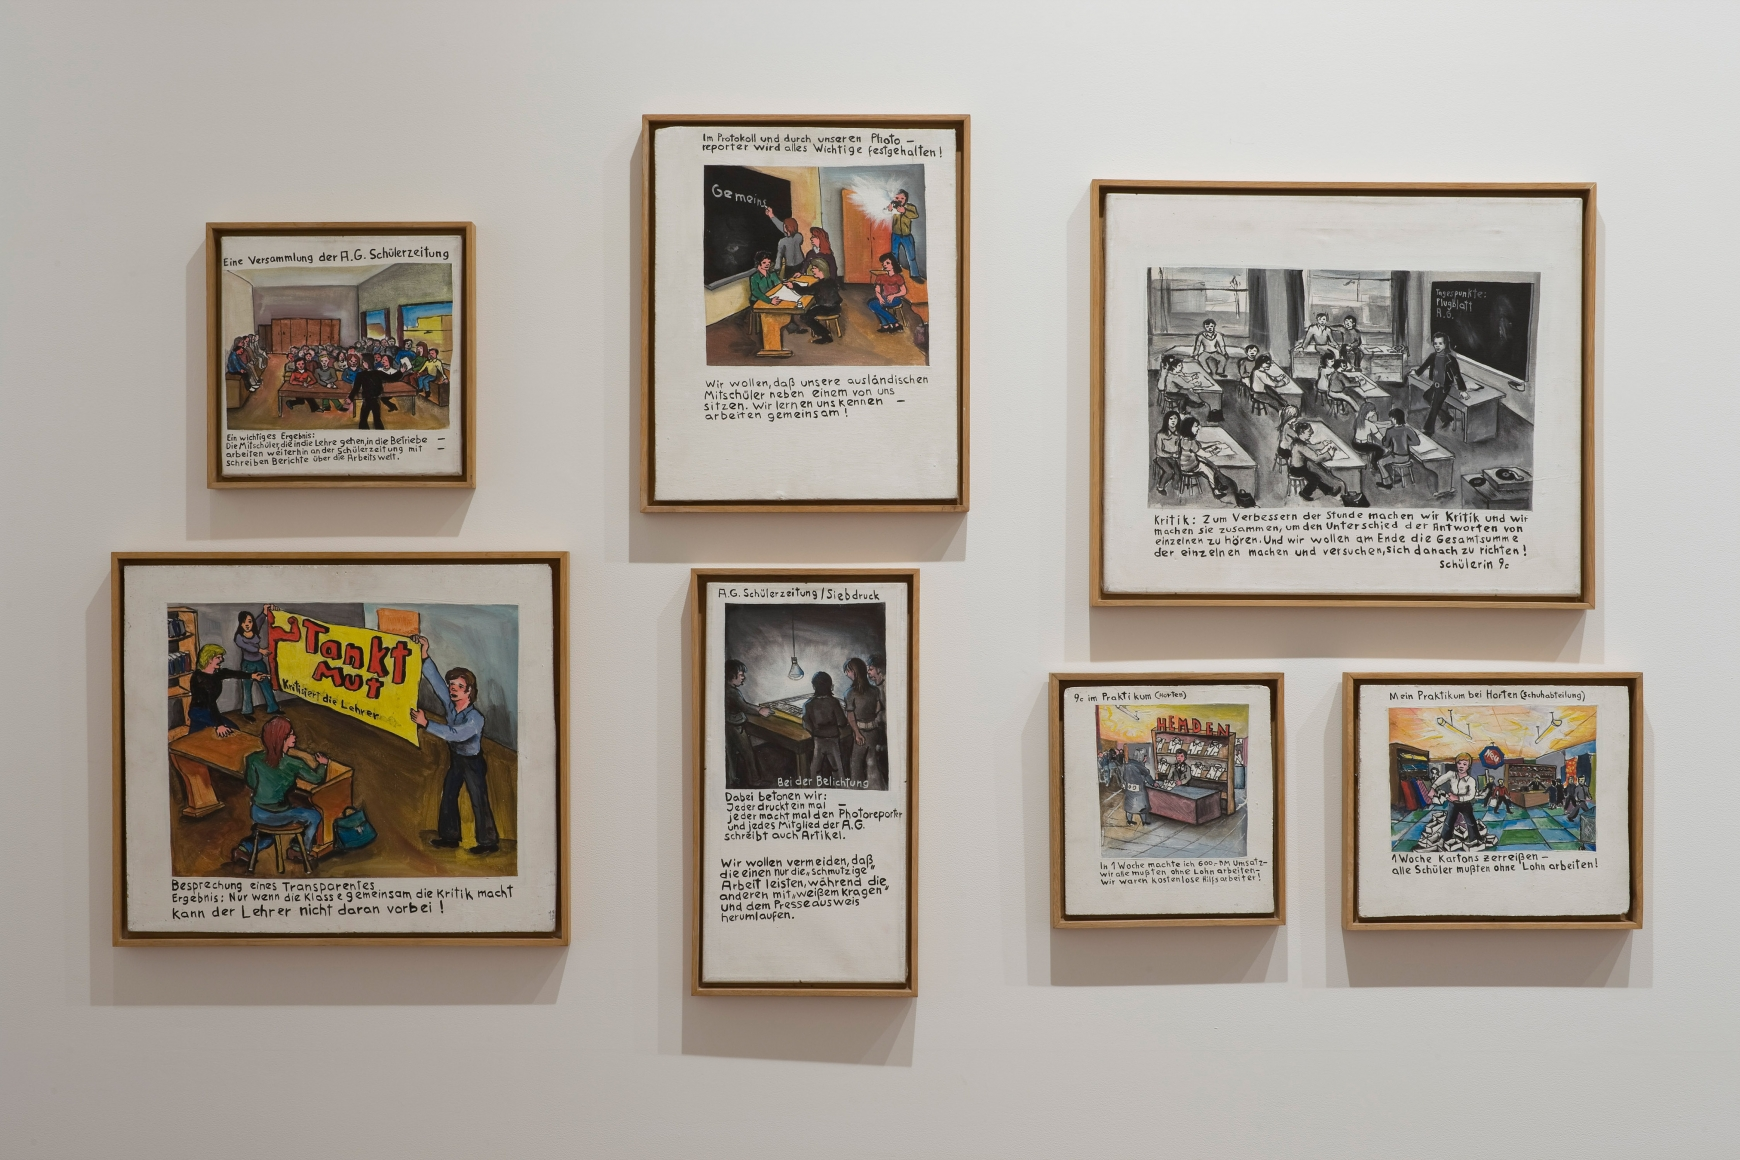 JÖRG IMMENDORFF, Maoist Paintings - The Early Seventies, 2009, Michael Werner New York Image 6